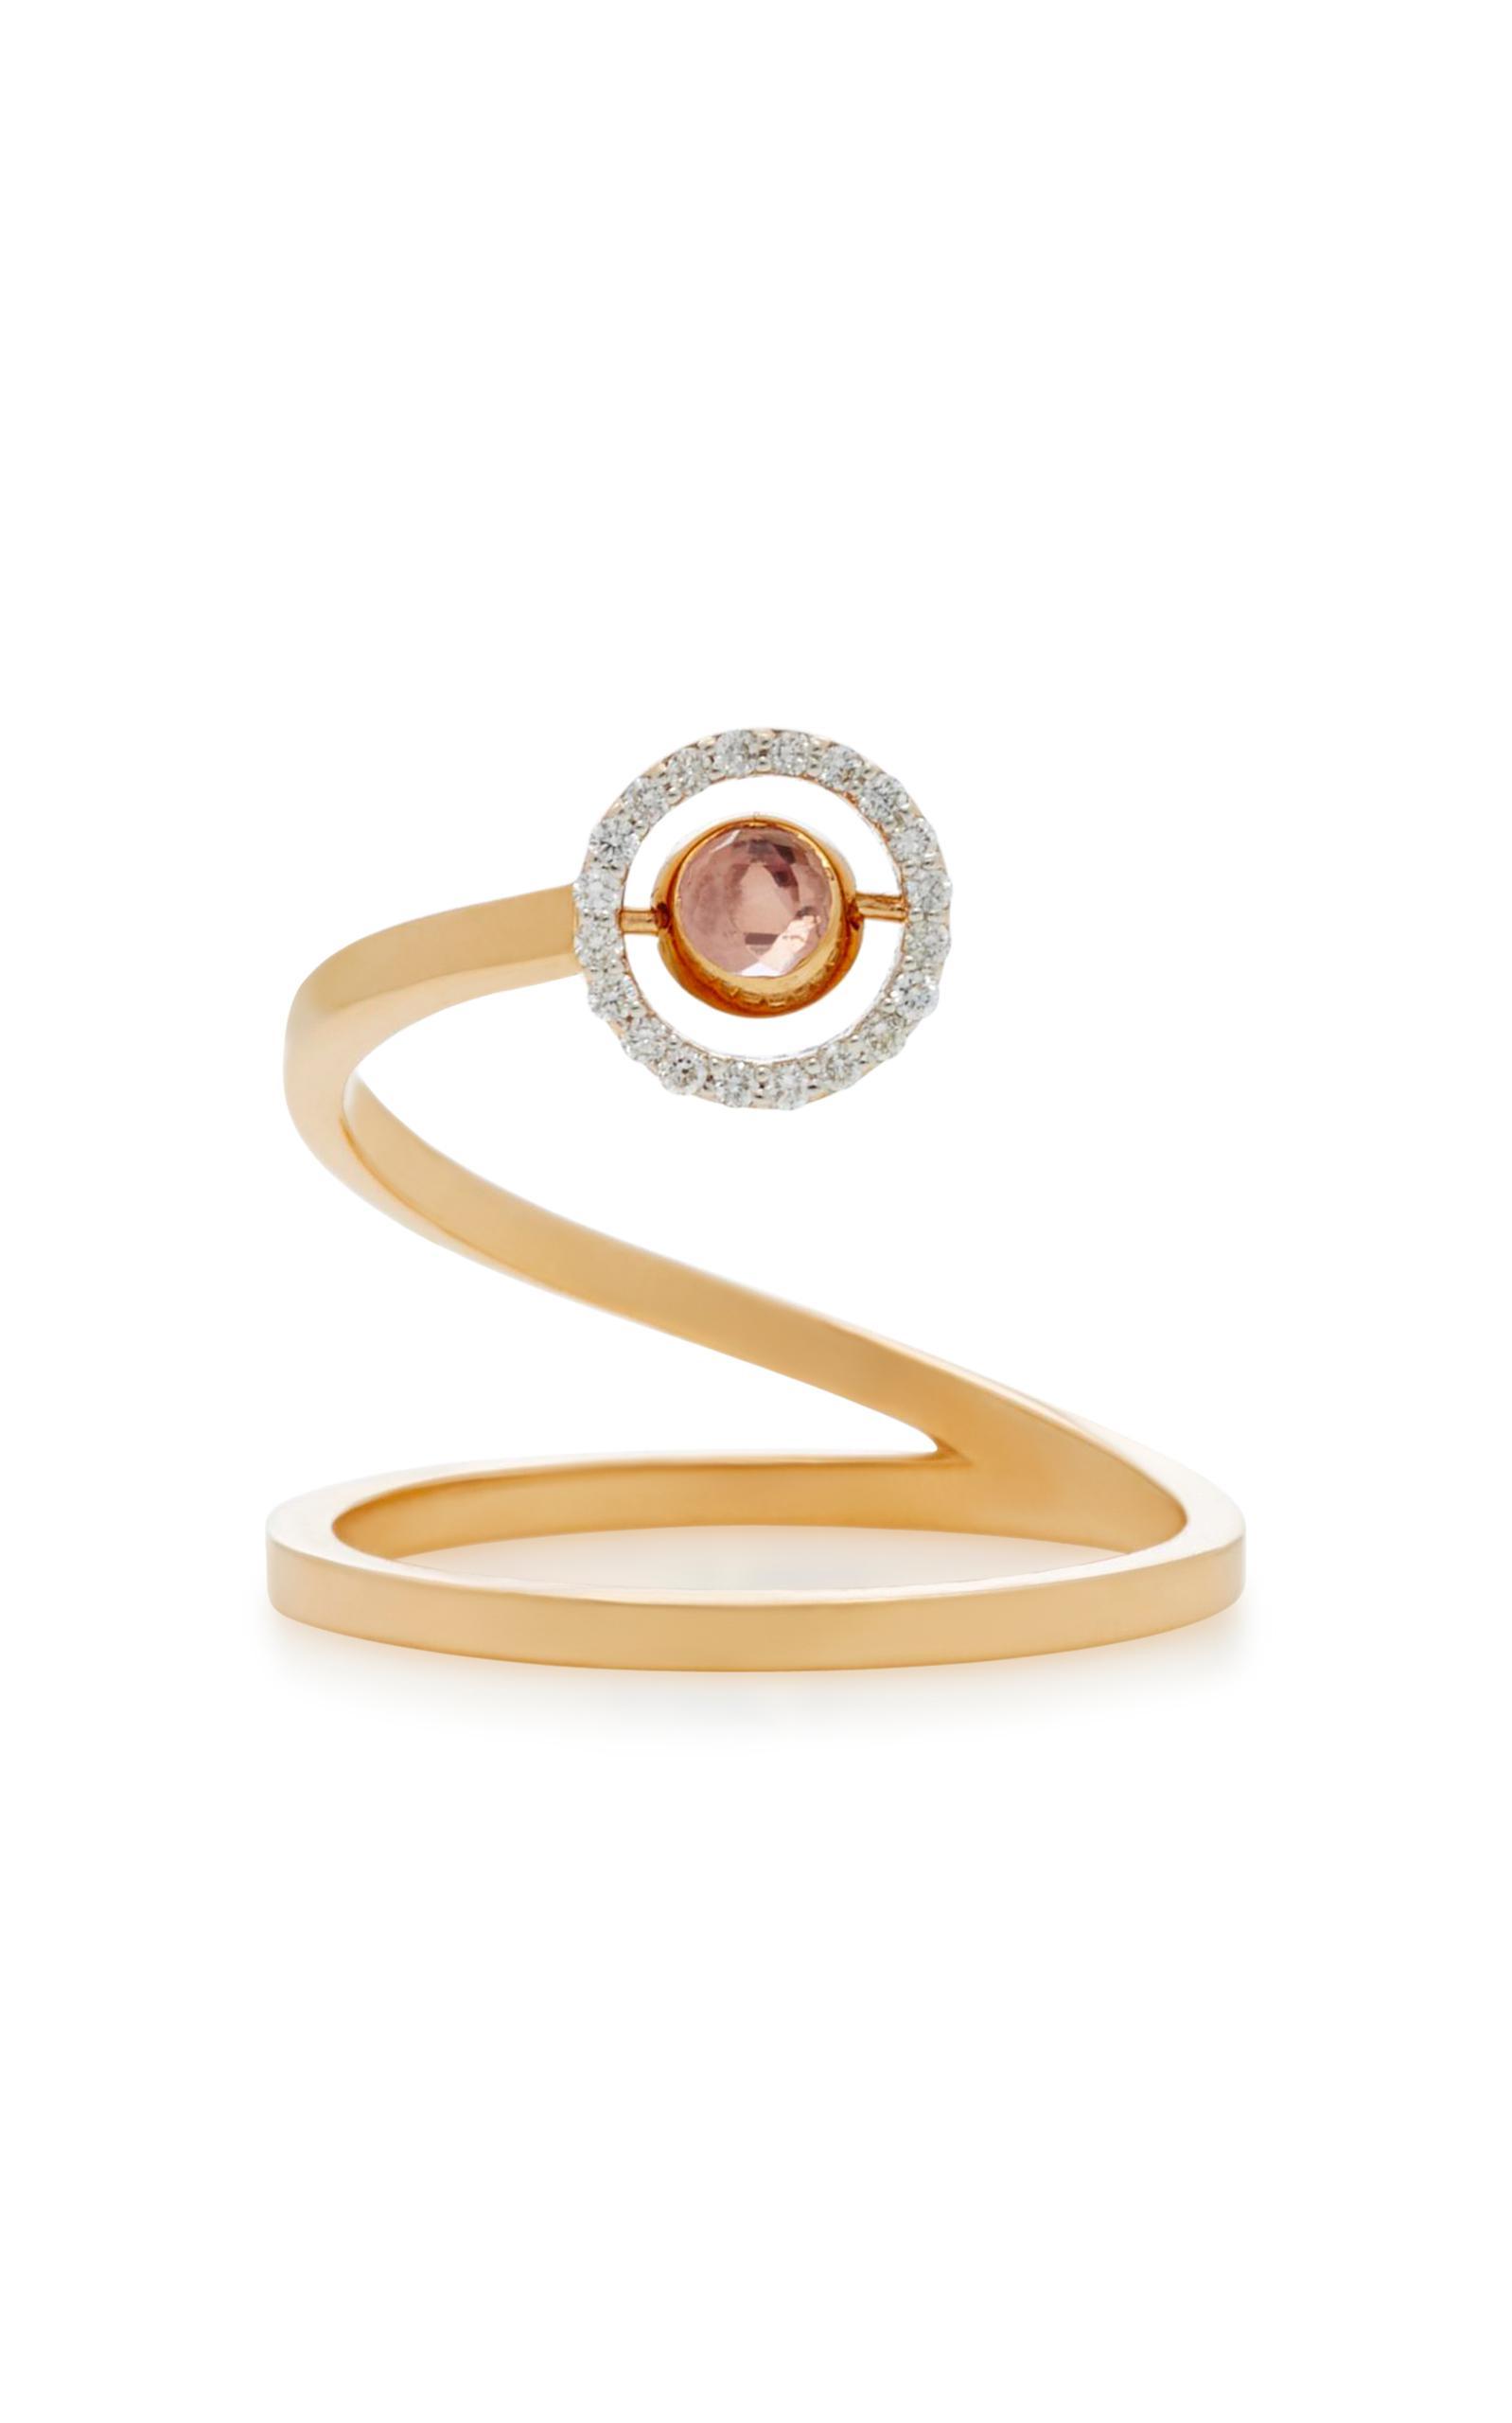 Marie Mas Swiveling Spiral Ring ufLfjCC